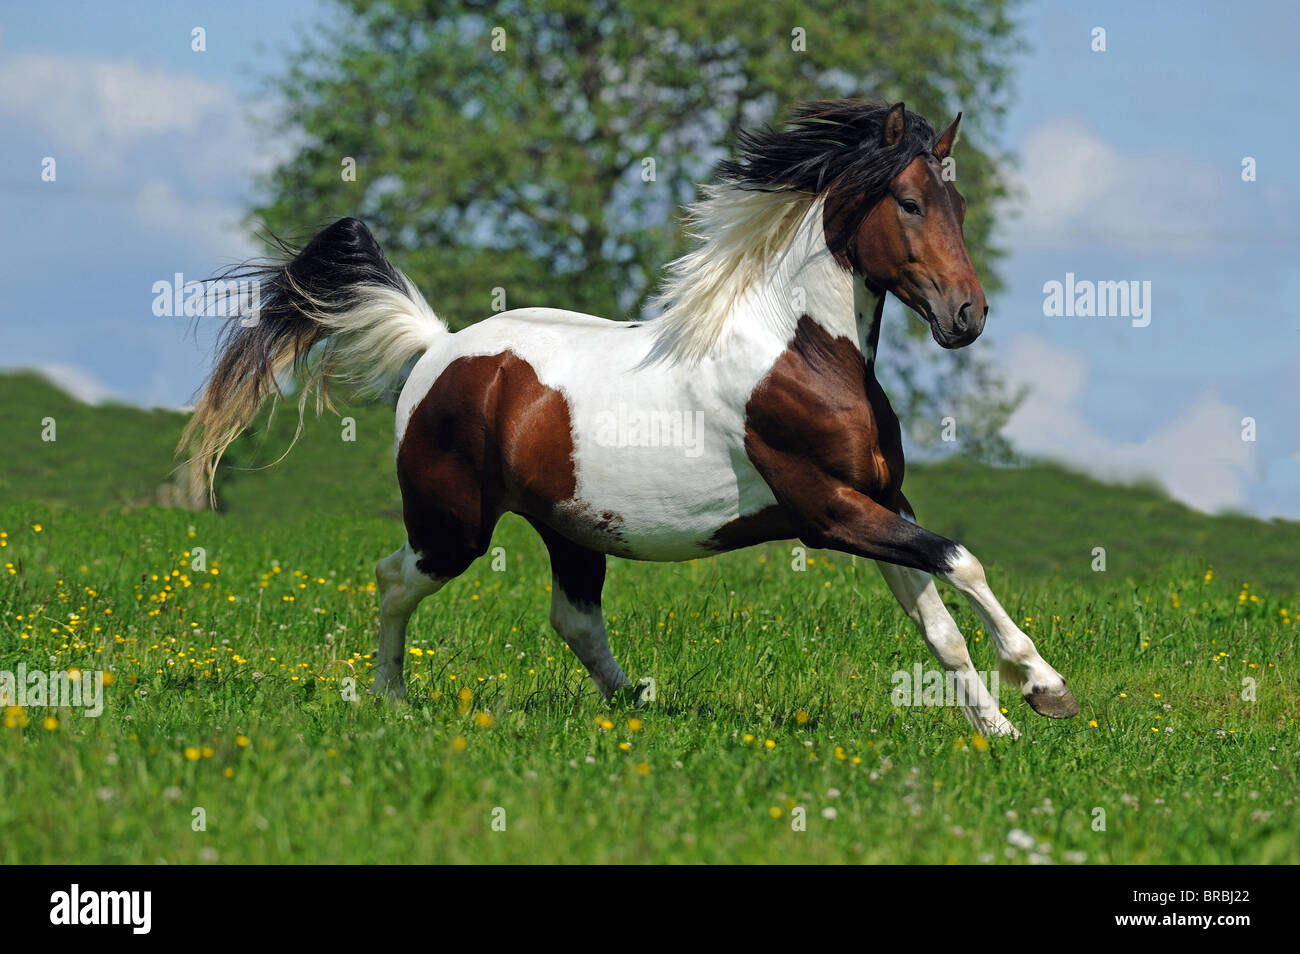 Lewitzer Horse (Equus ferus caballus), stallion in a gallop on a pasture. Stock Photo